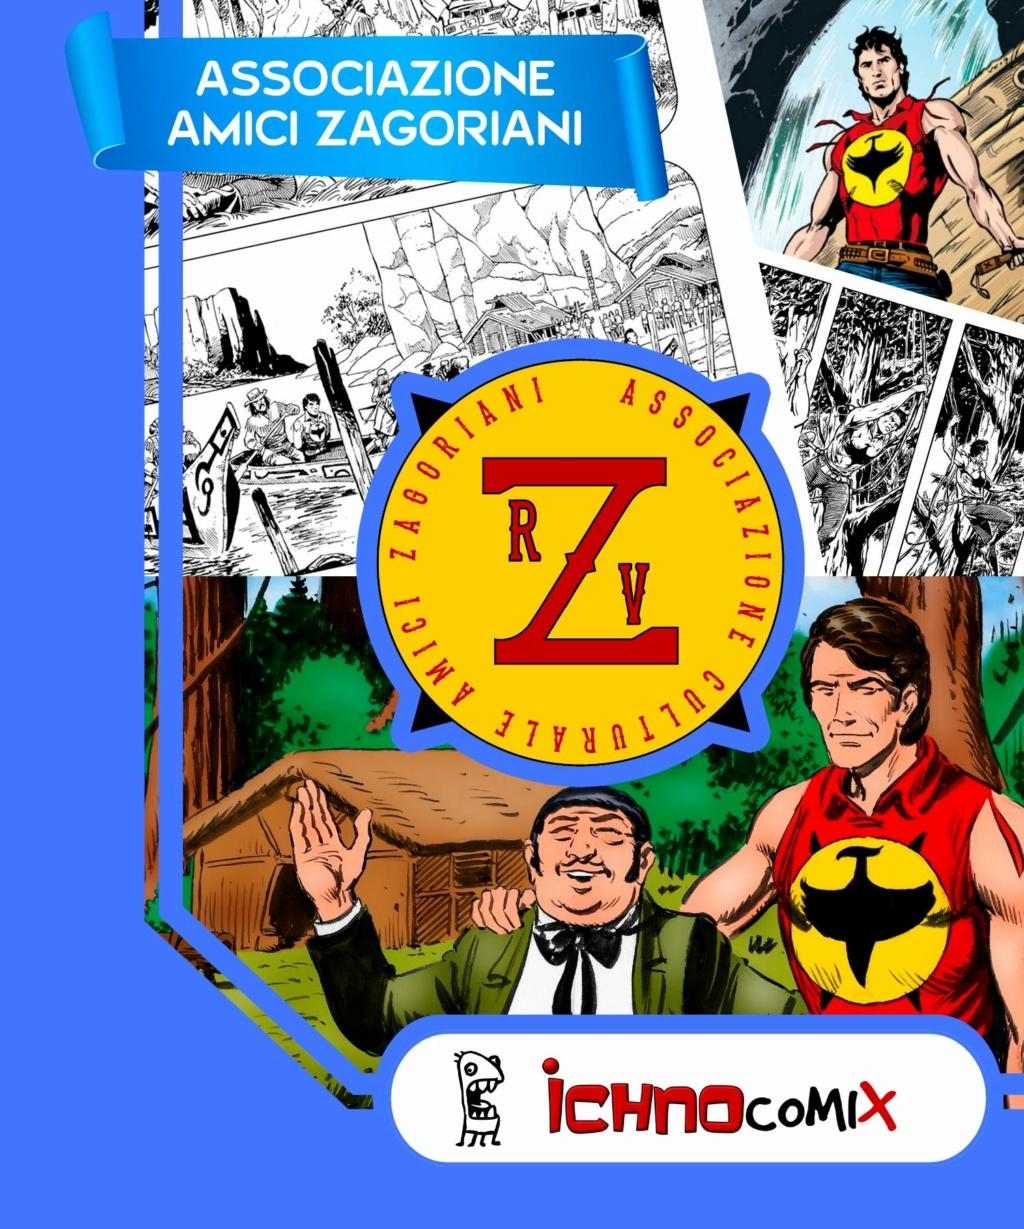 4° rendez-vous degli amici di Zagor Az10